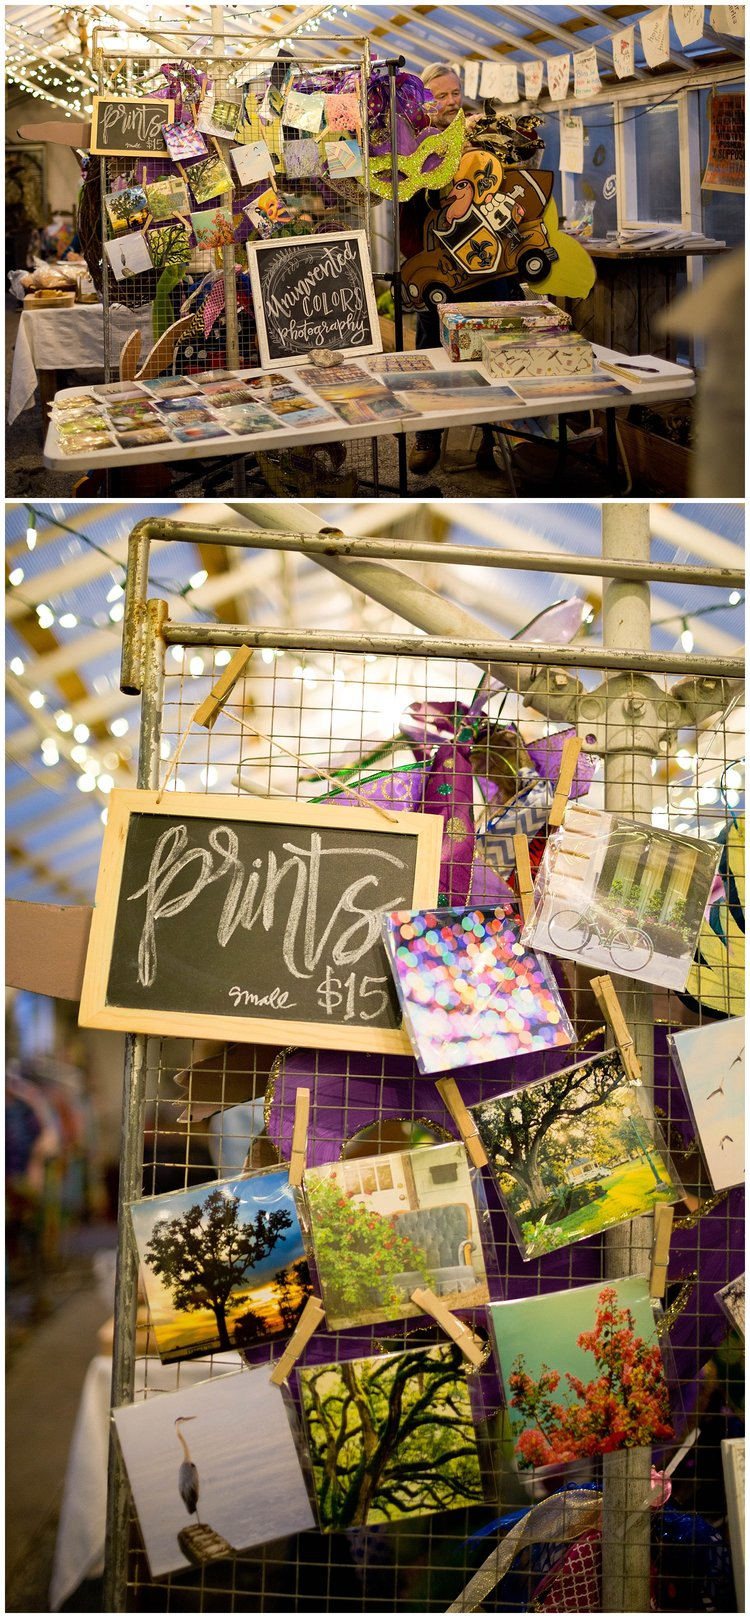 Greenhouse Opp Shop! — Uninvented Colors Photography on medical shop, pool shop, the best shop, retail shop, science shop, car repair shop, shed shop, carport shop, basement shop, photography shop,